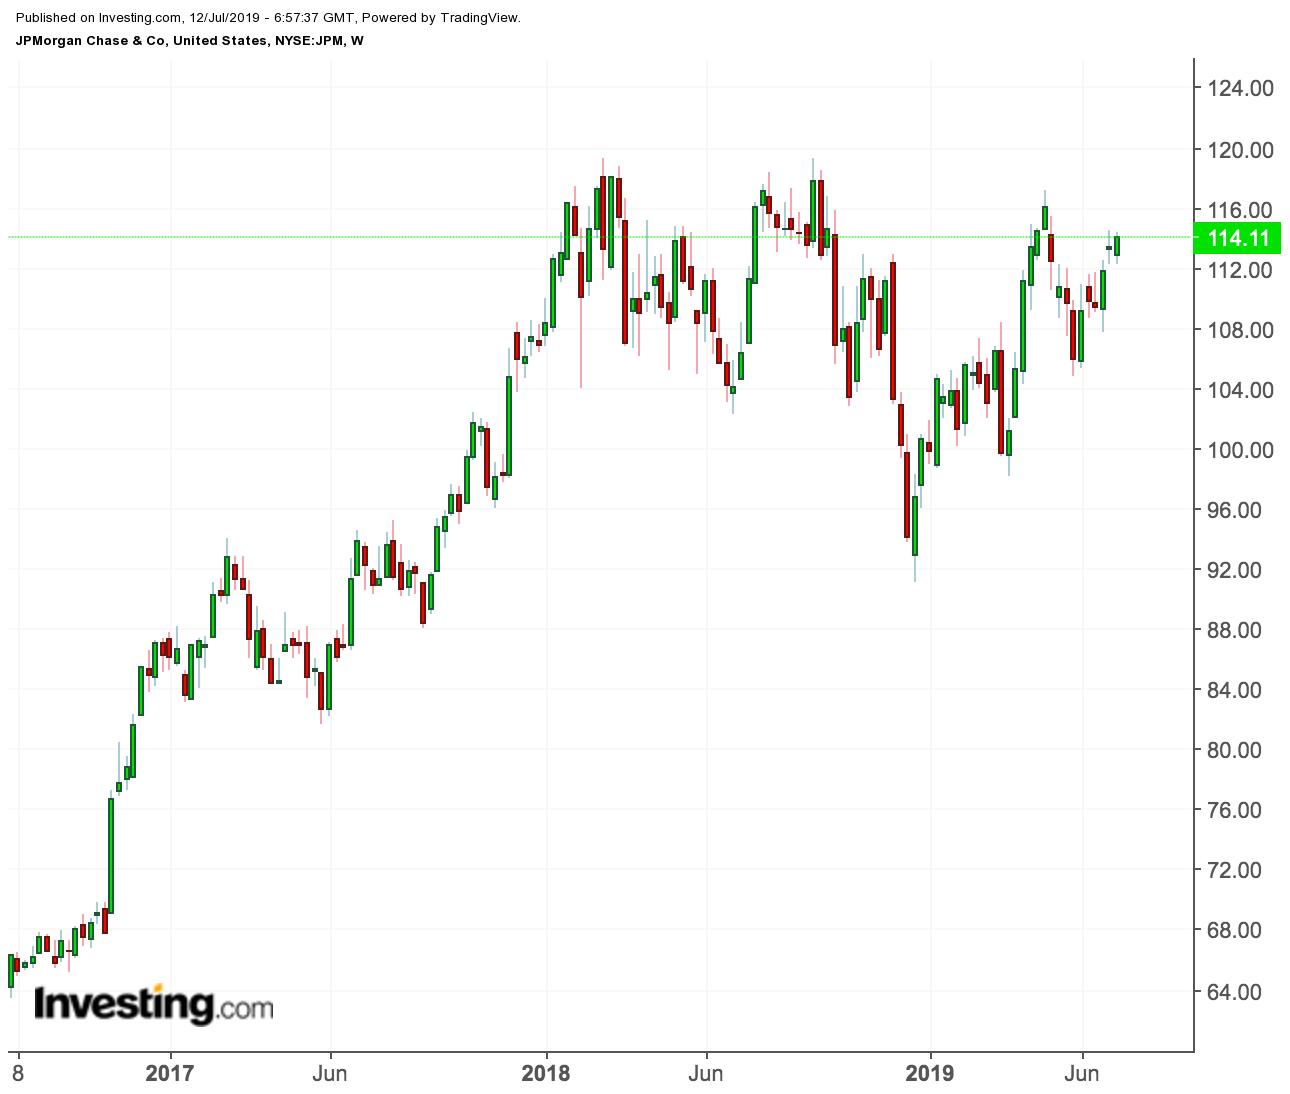 JPMorgan price chart